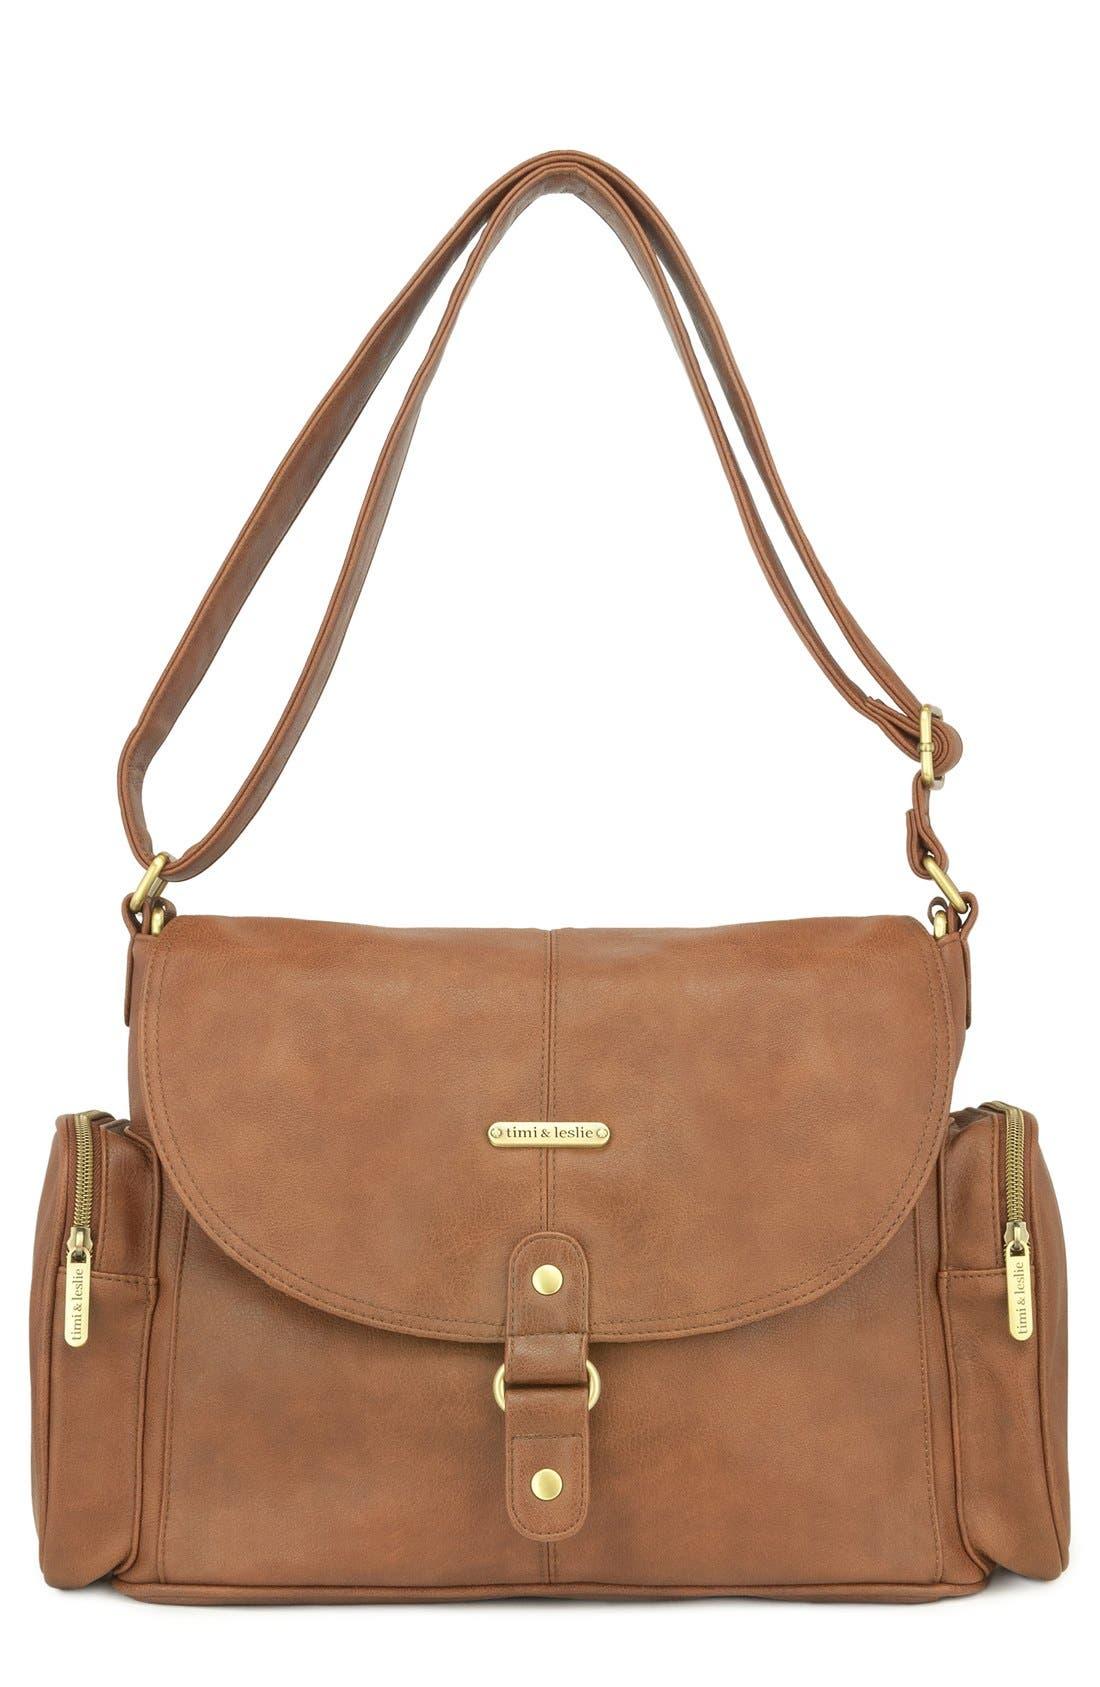 Alternate Image 1 Selected - Timi & Leslie 'Metro Messenger' Faux Leather Diaper Bag